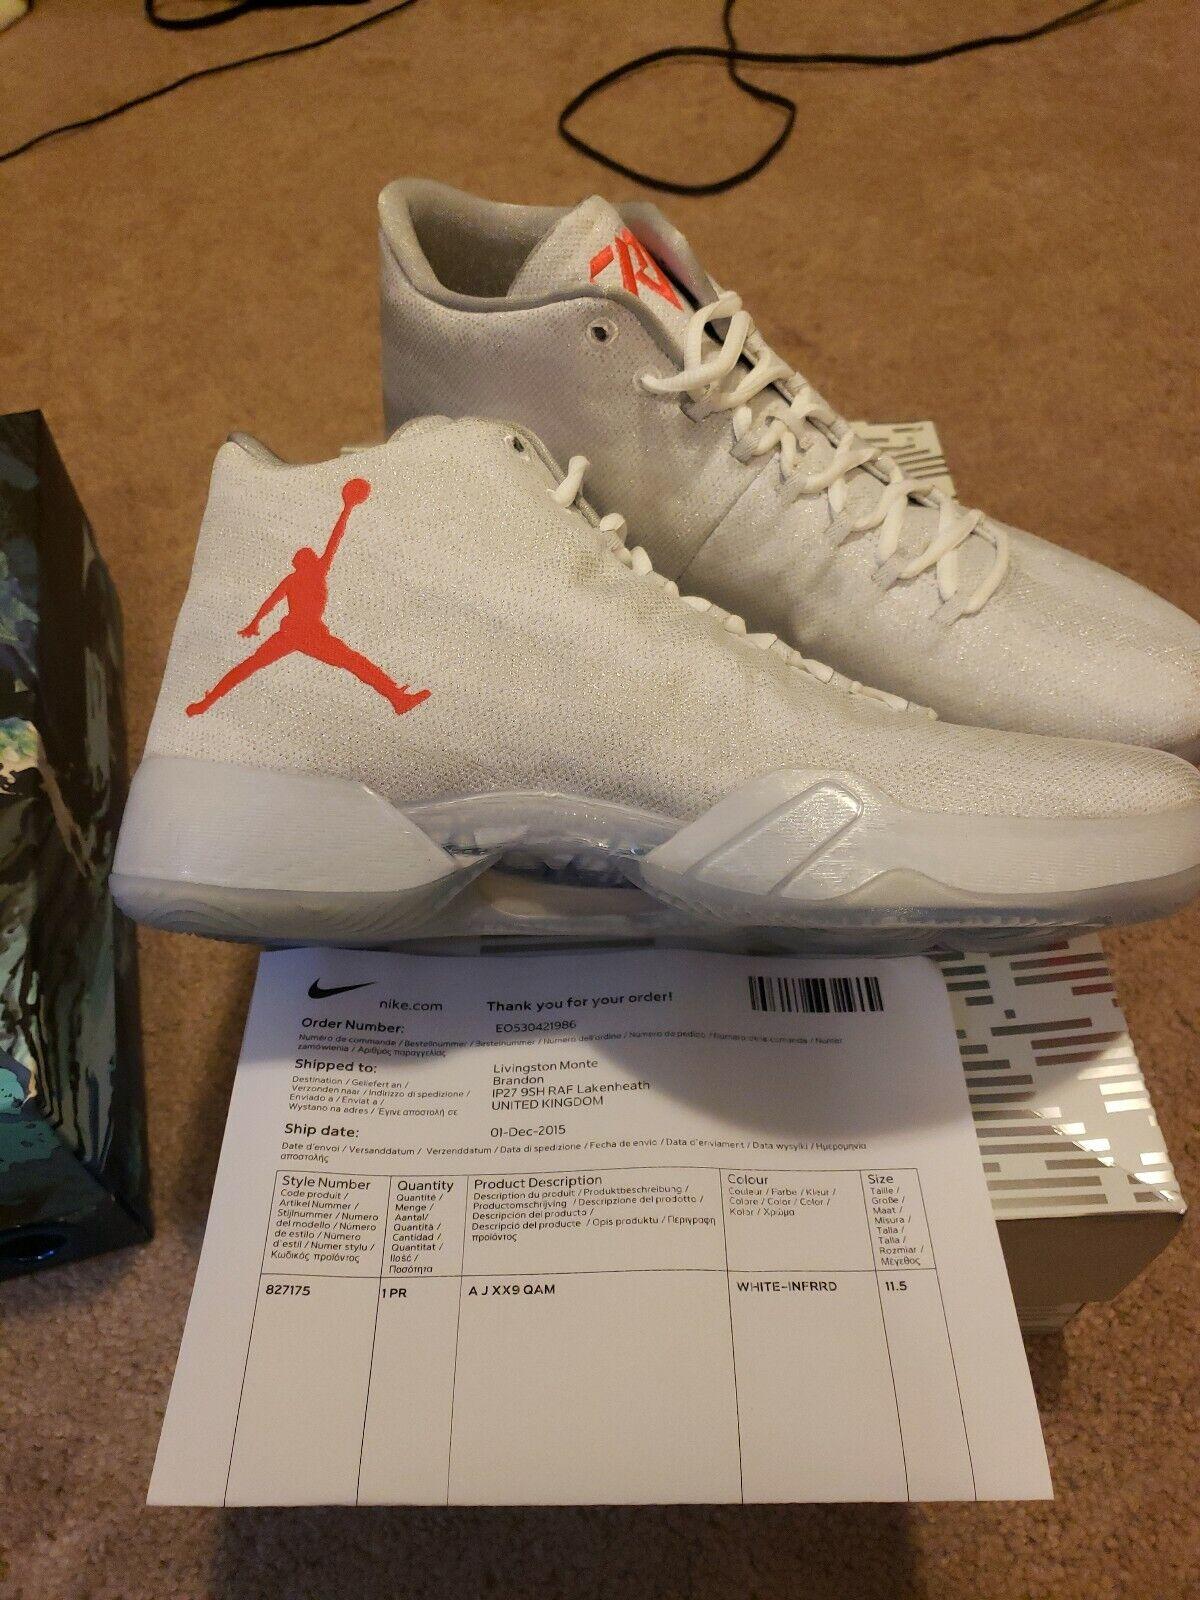 vente chaude en ligne be1b9 7f172 Nike Air Jordan 29 XX9 All Star Westbrook PE Size 11.5. 827175-160 UK only  drop